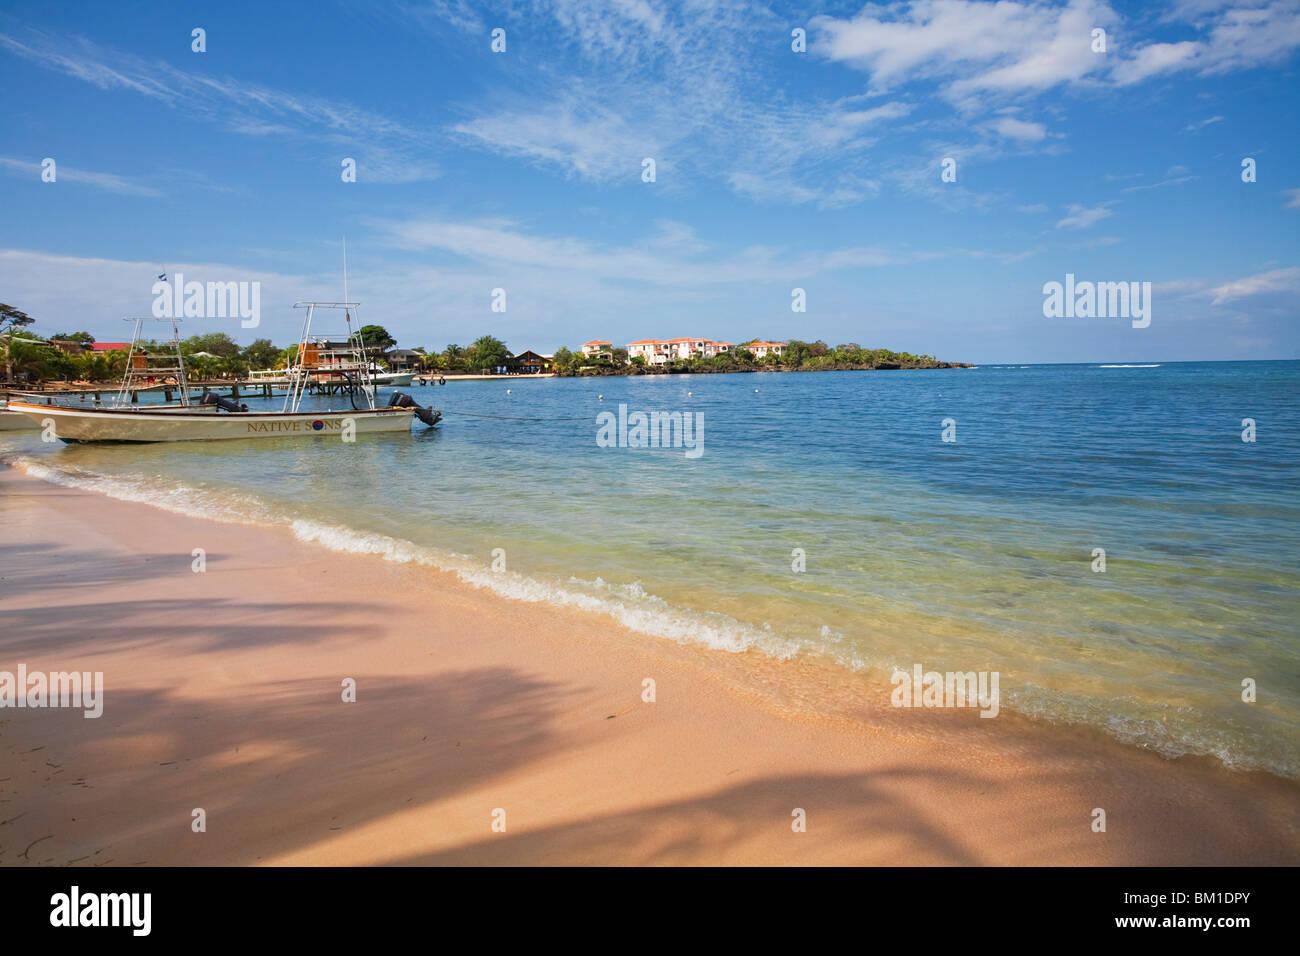 Half Moon Bay, Roatan, Bay Islands, Honduras, Central America - Stock Image